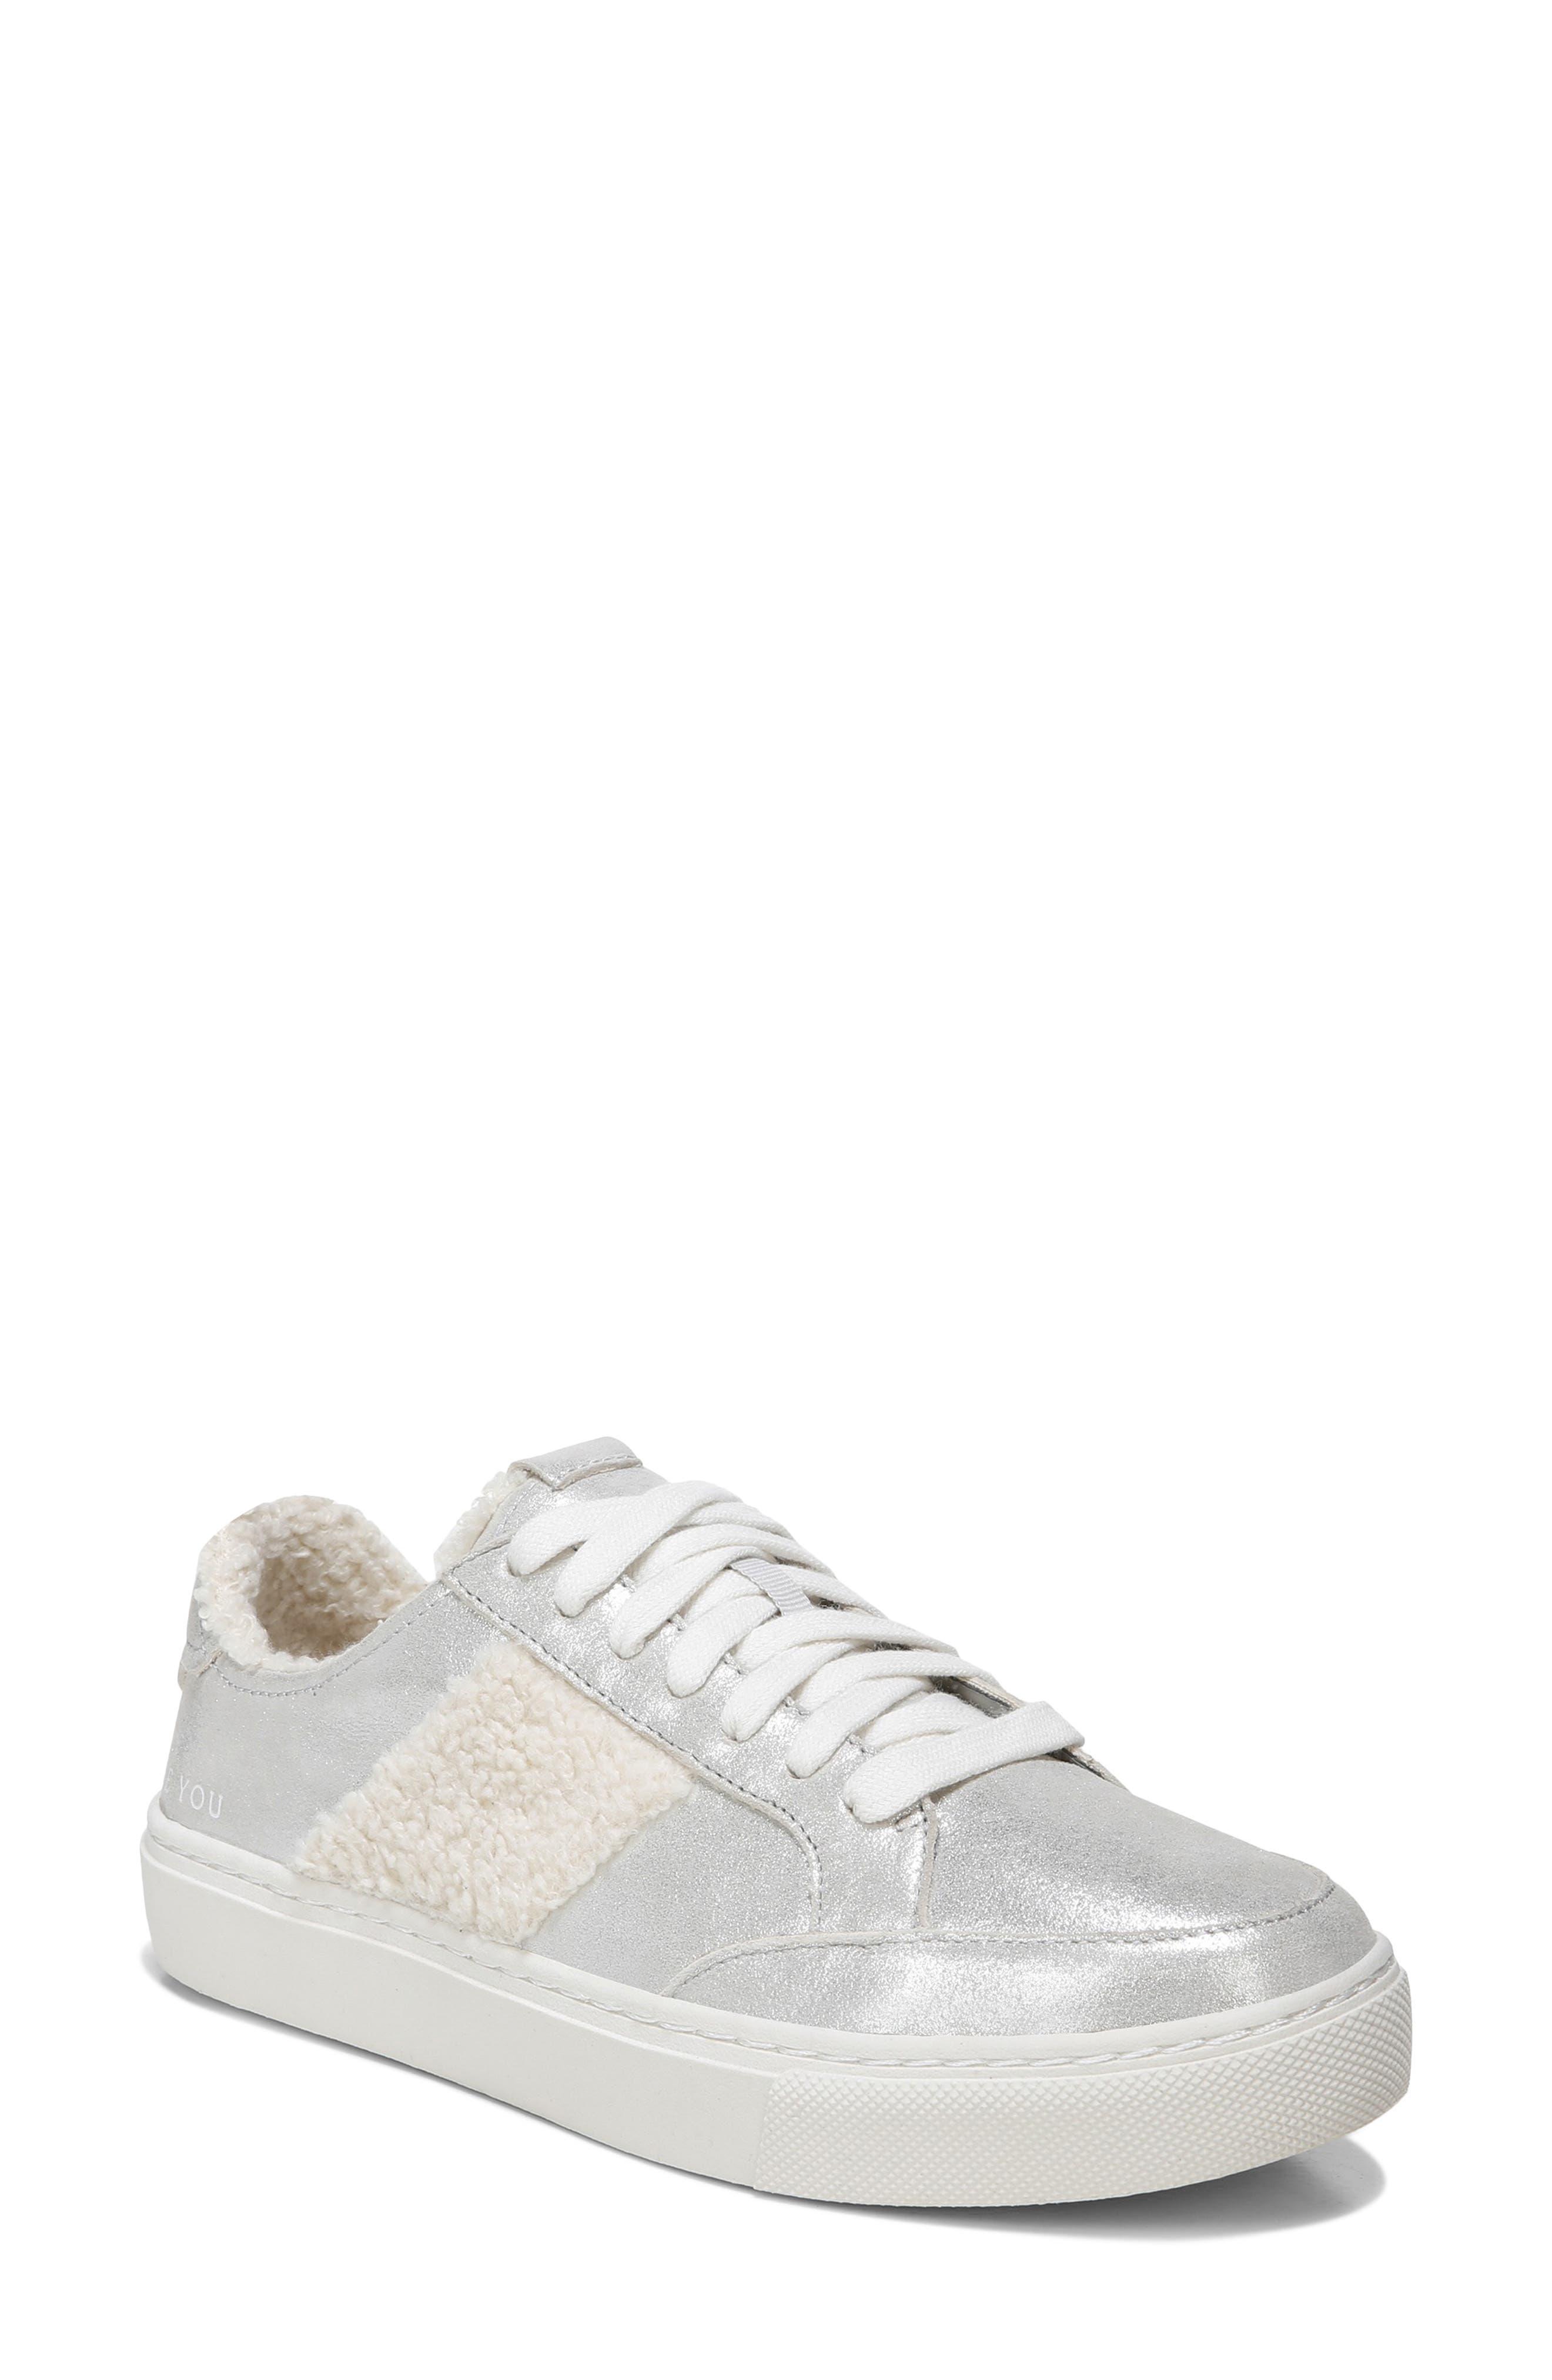 All In Chill Sneaker